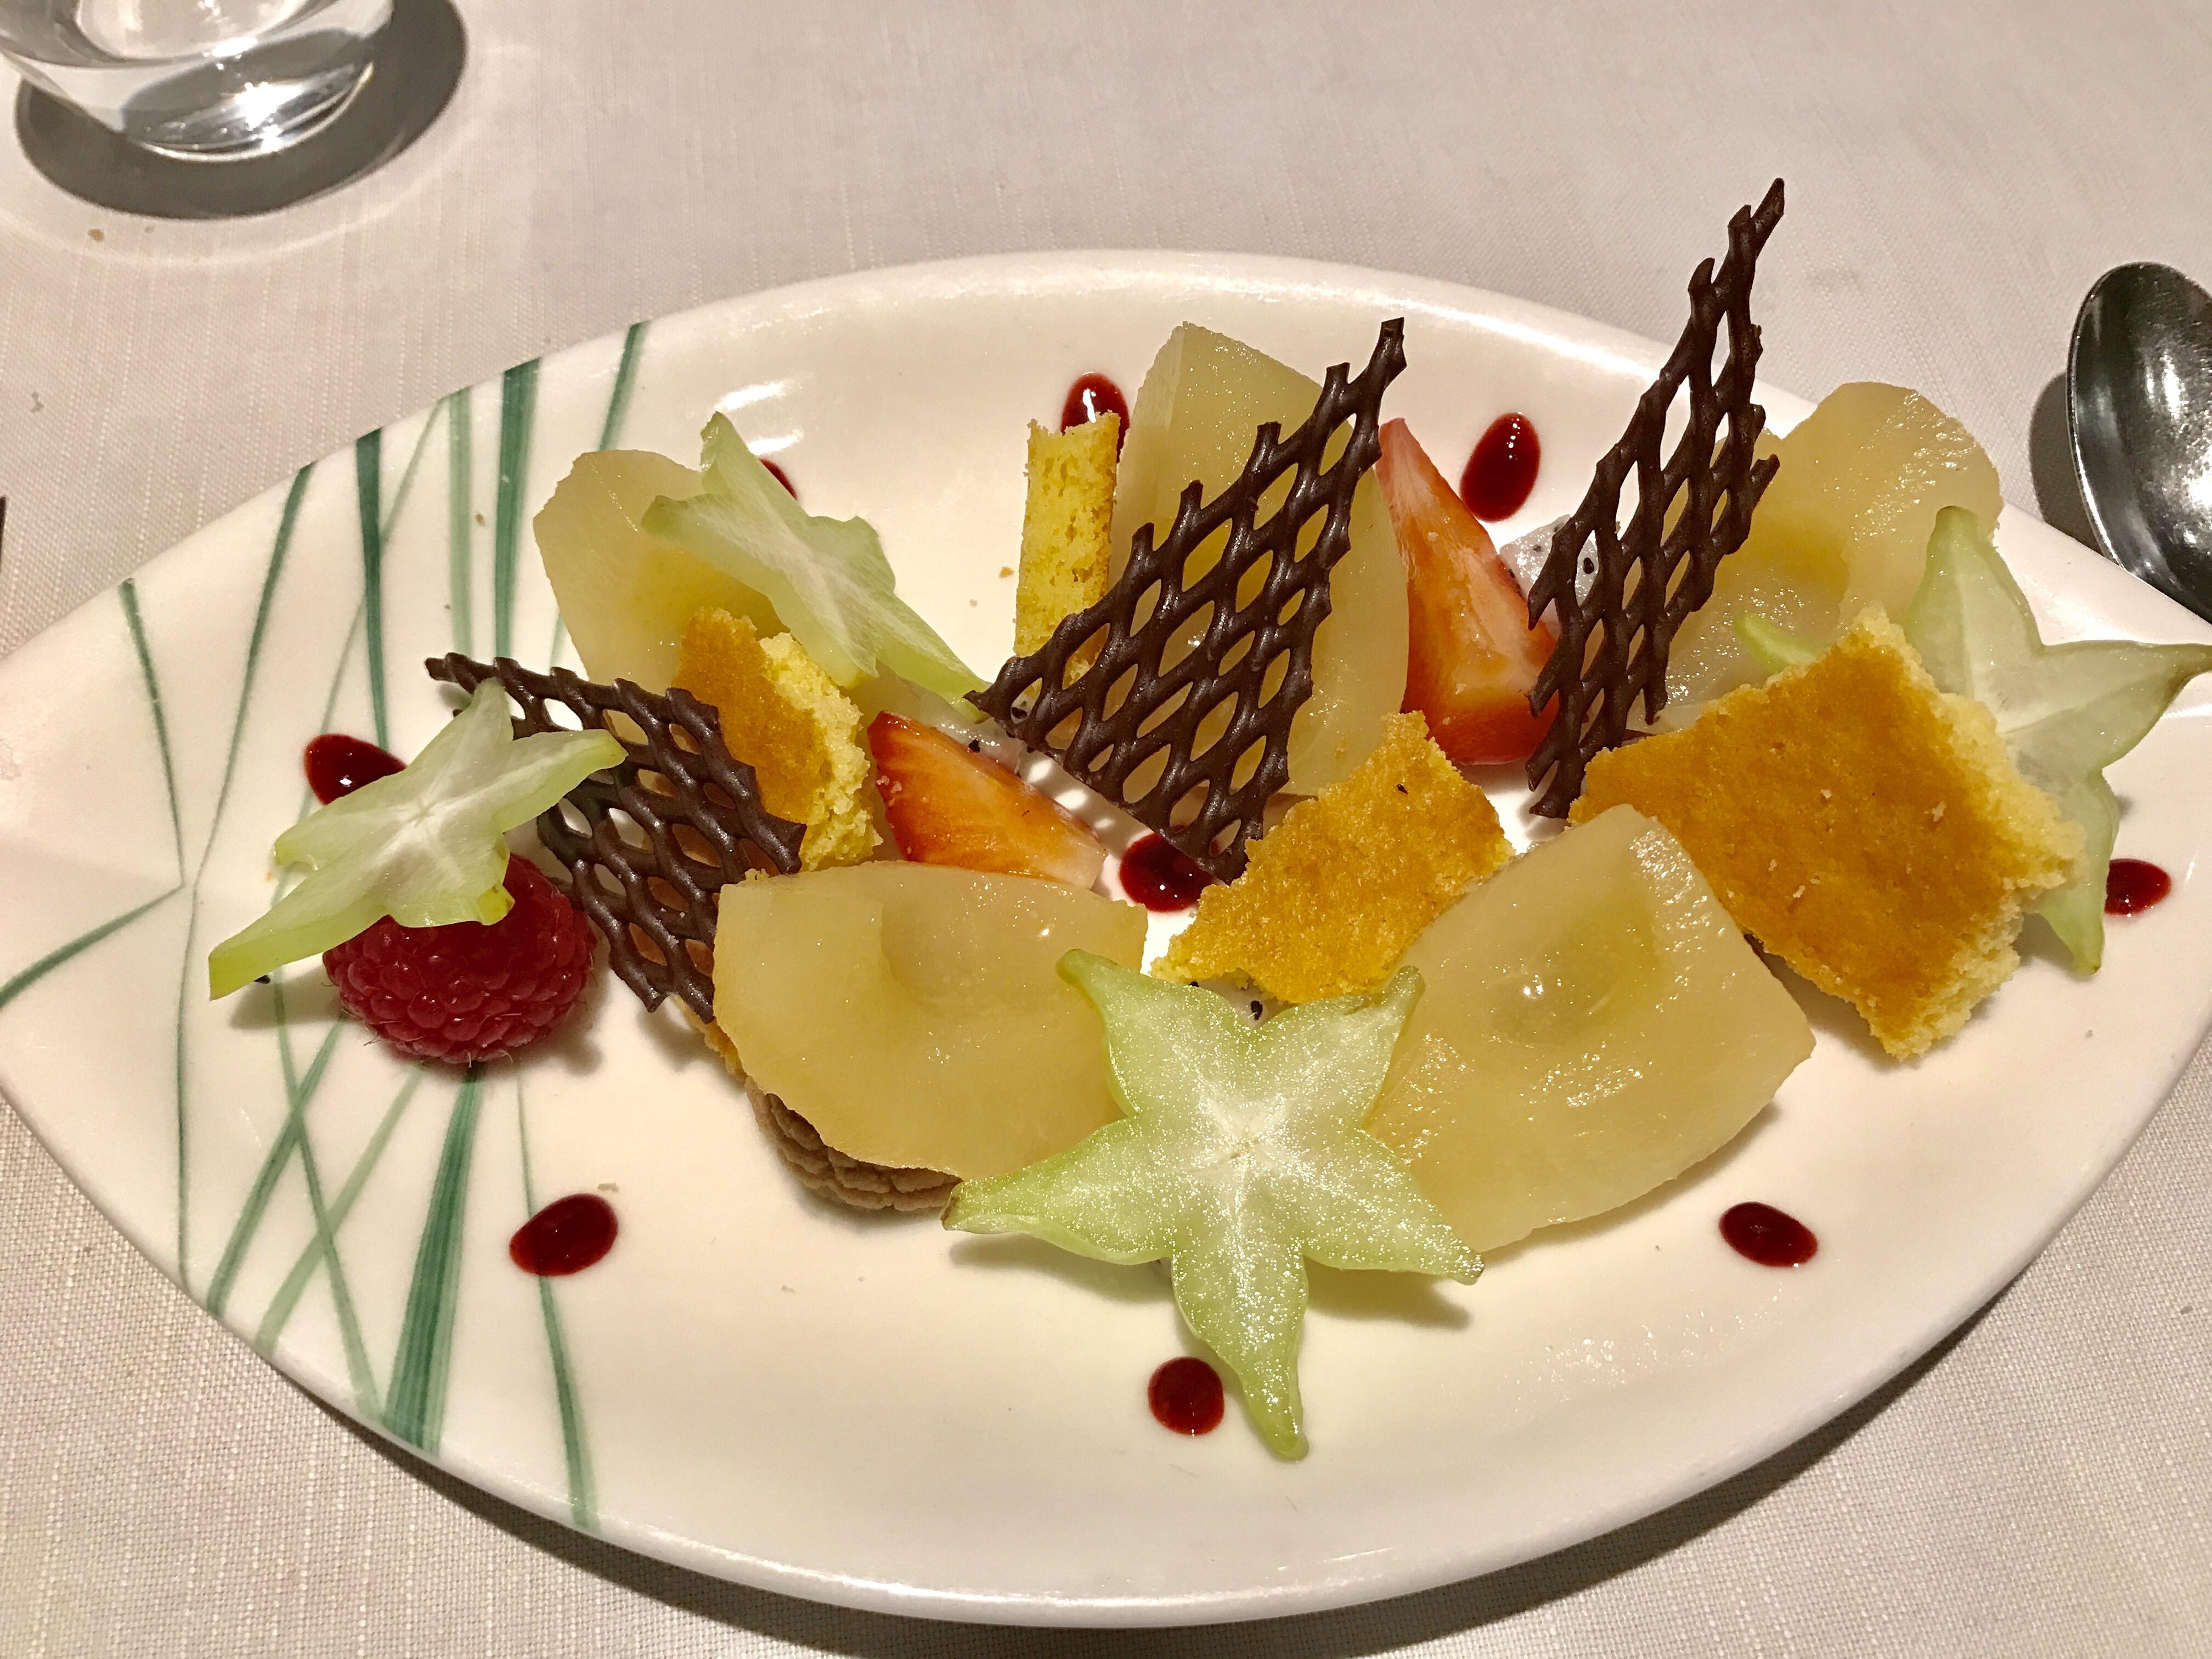 Restaurant AOC boulogne